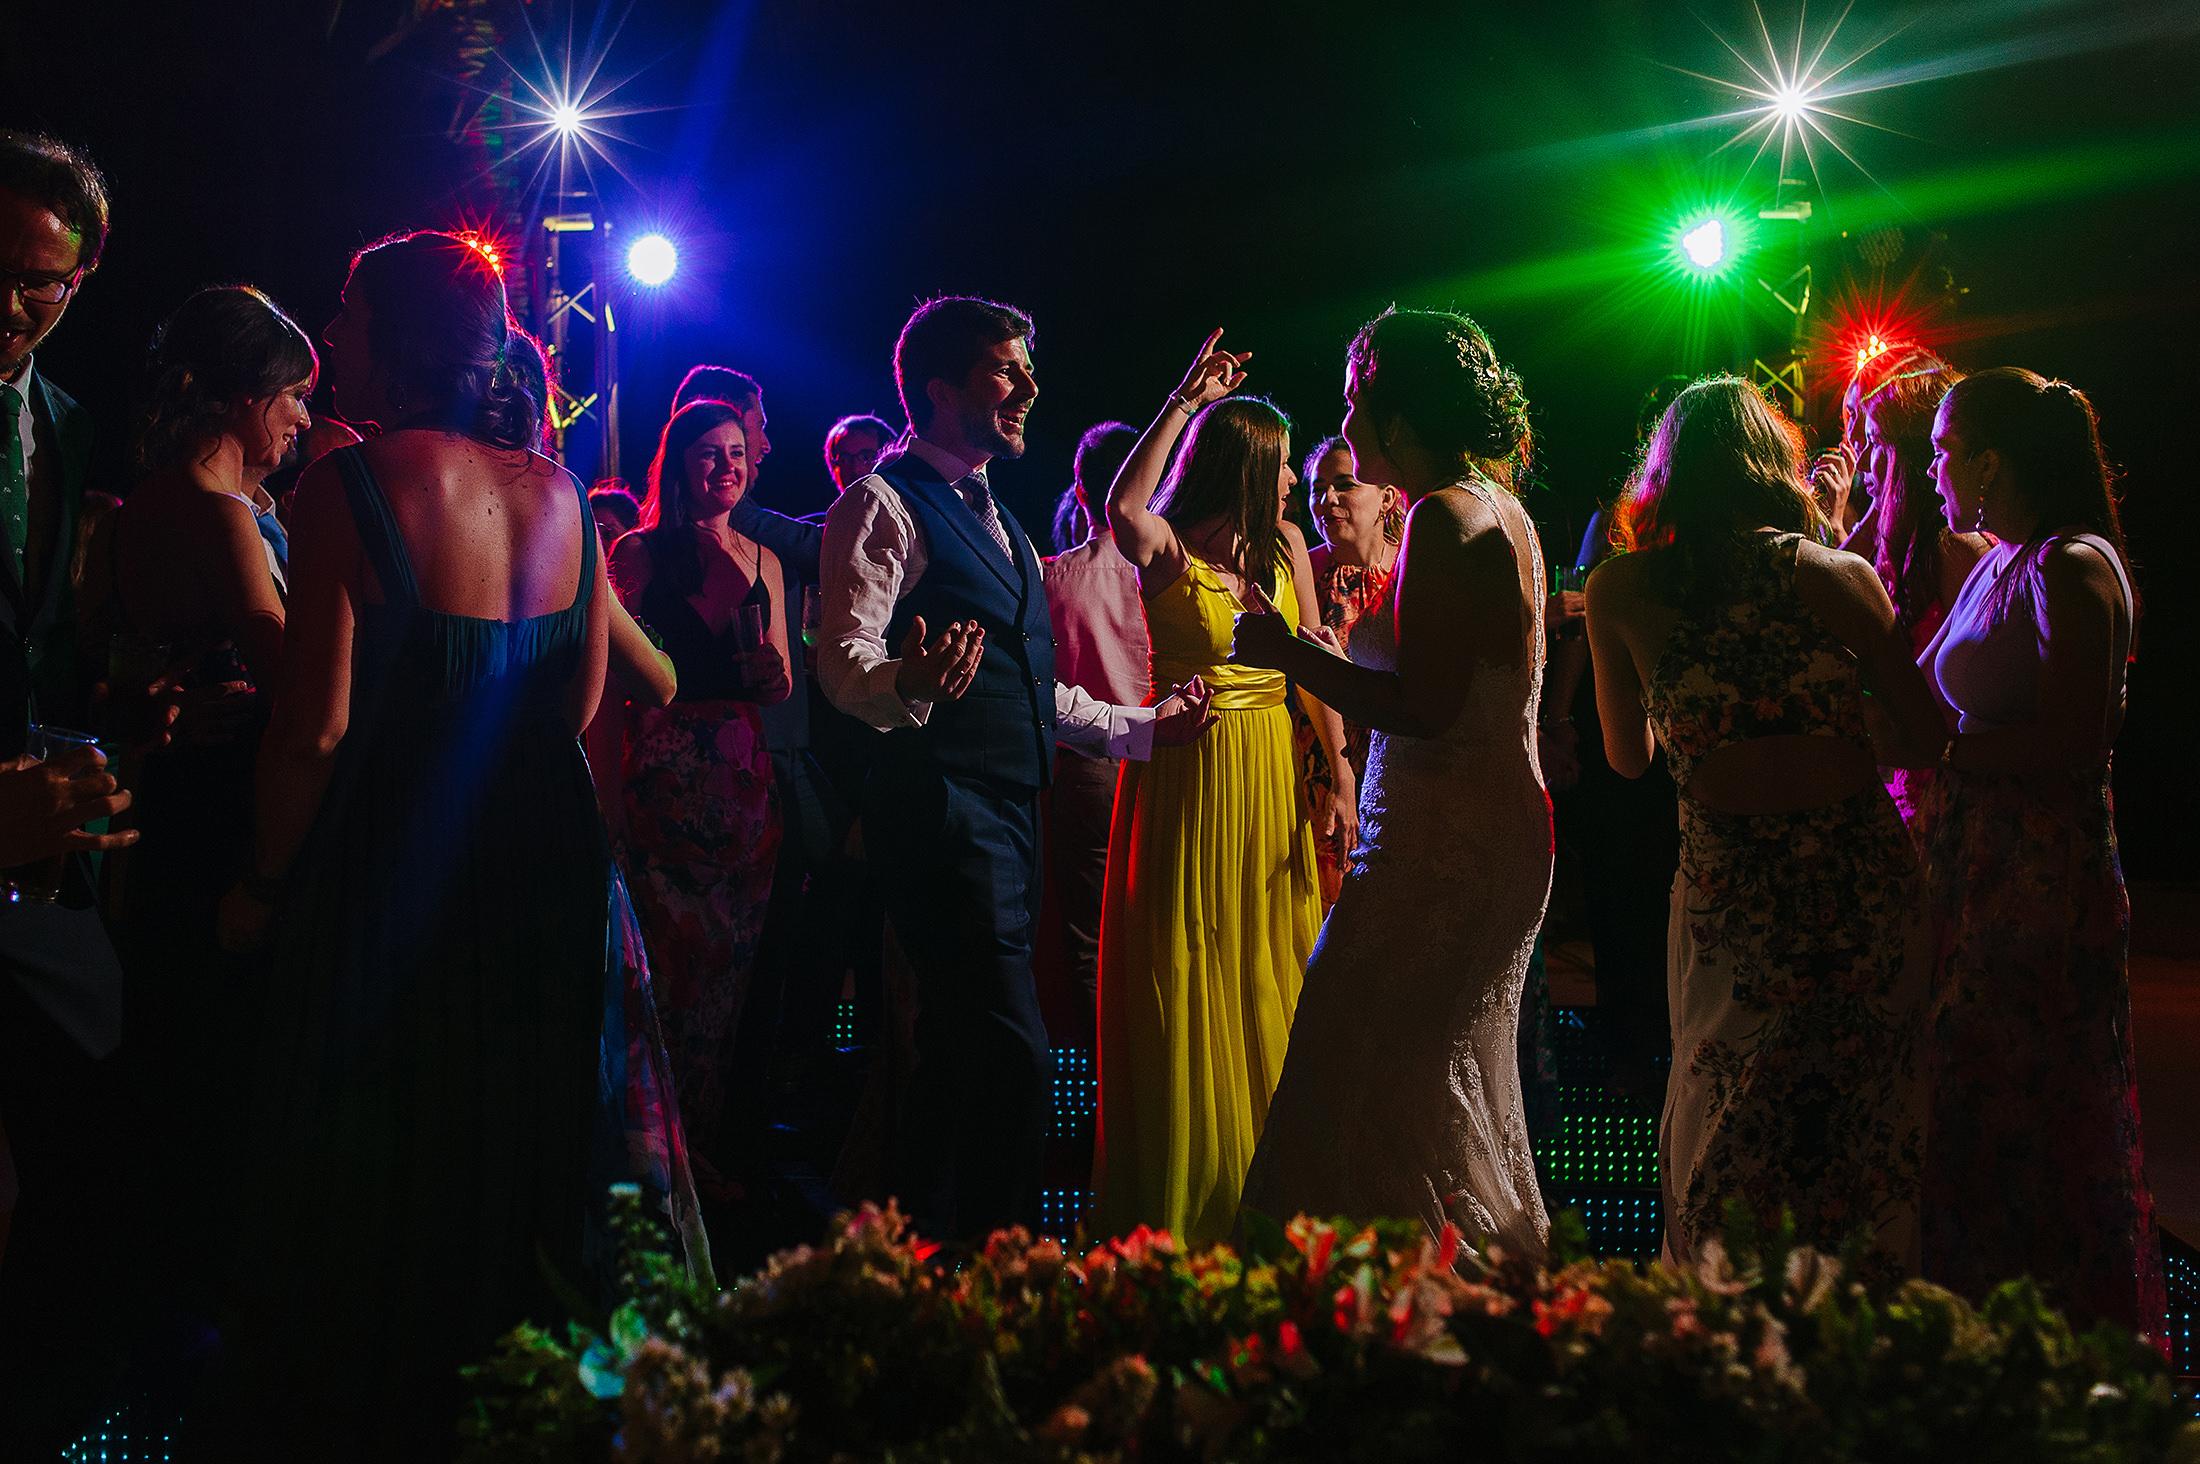 Packed dance floor of wedding guests in Riviera Maya